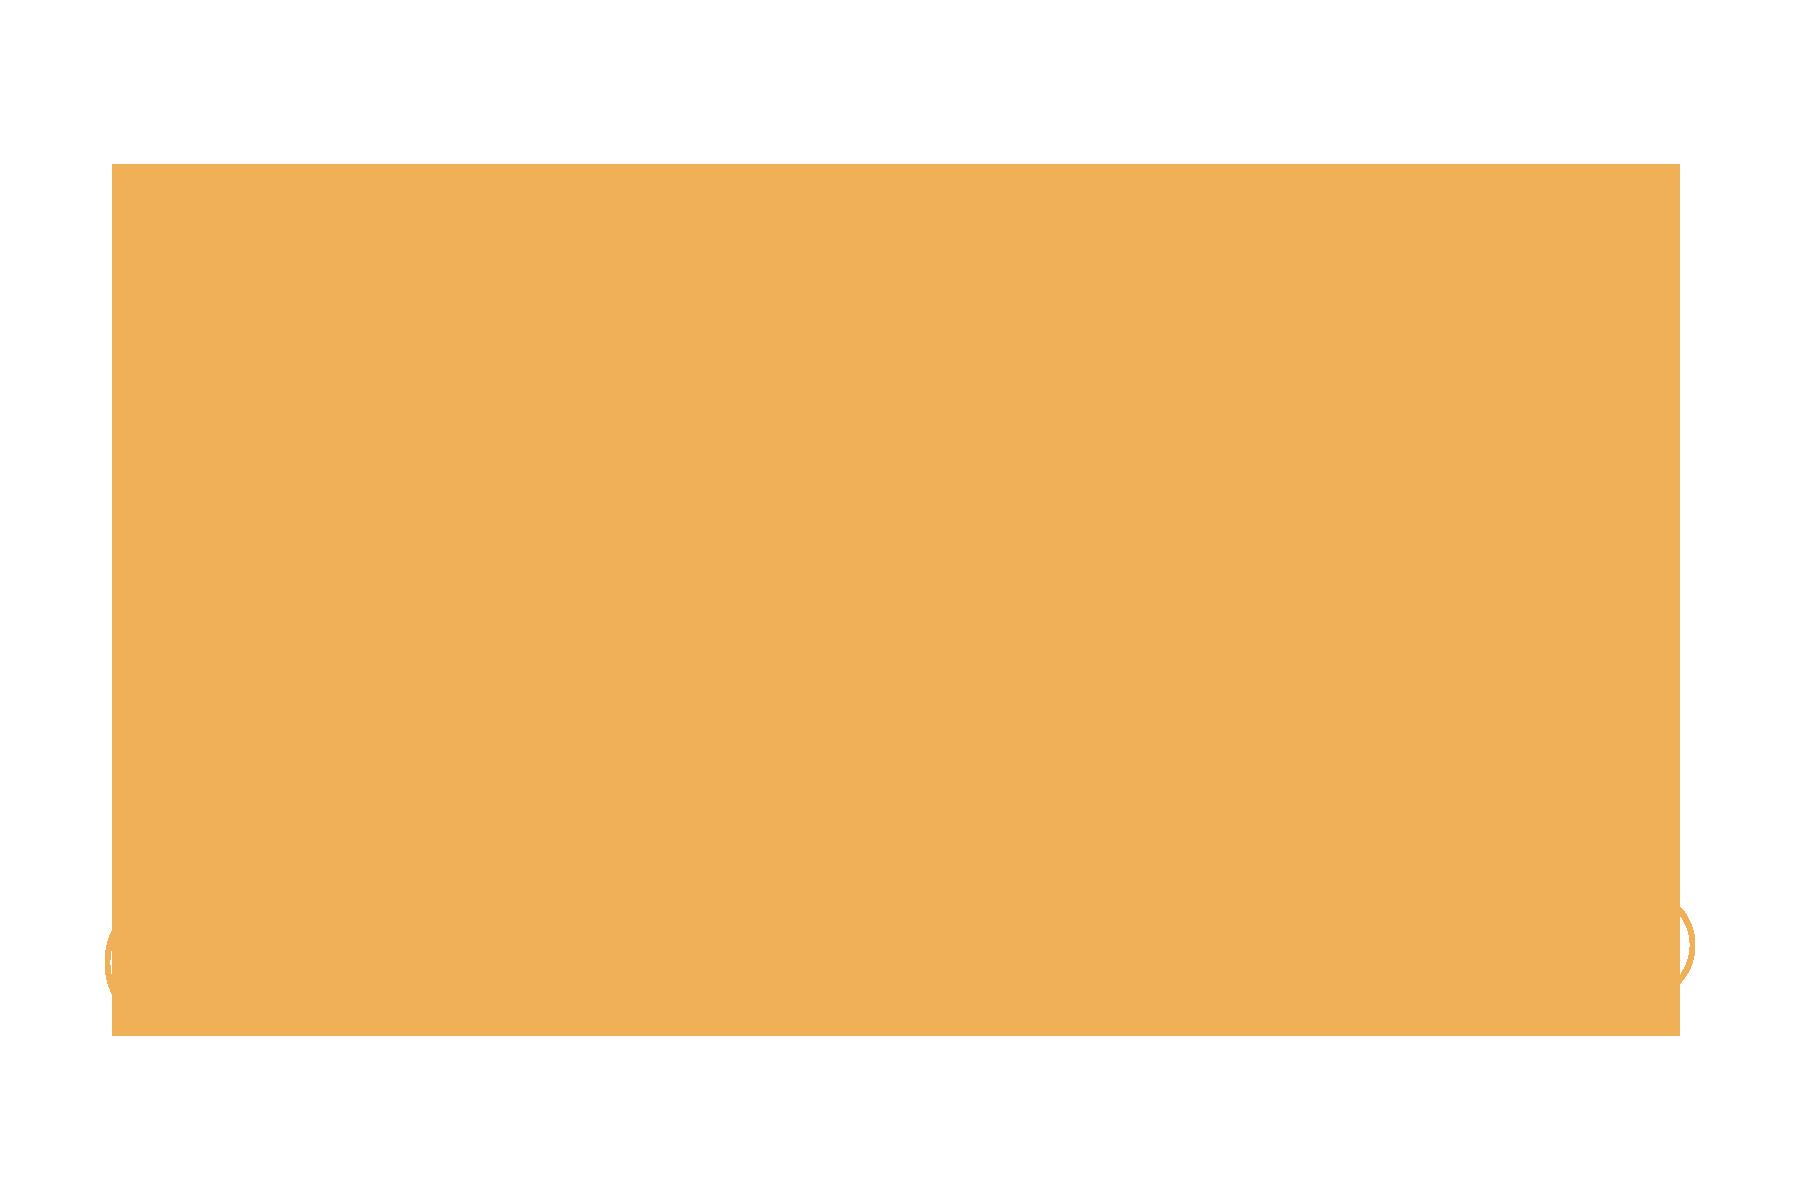 A golden custom typeface, inspired by Art Deco design.